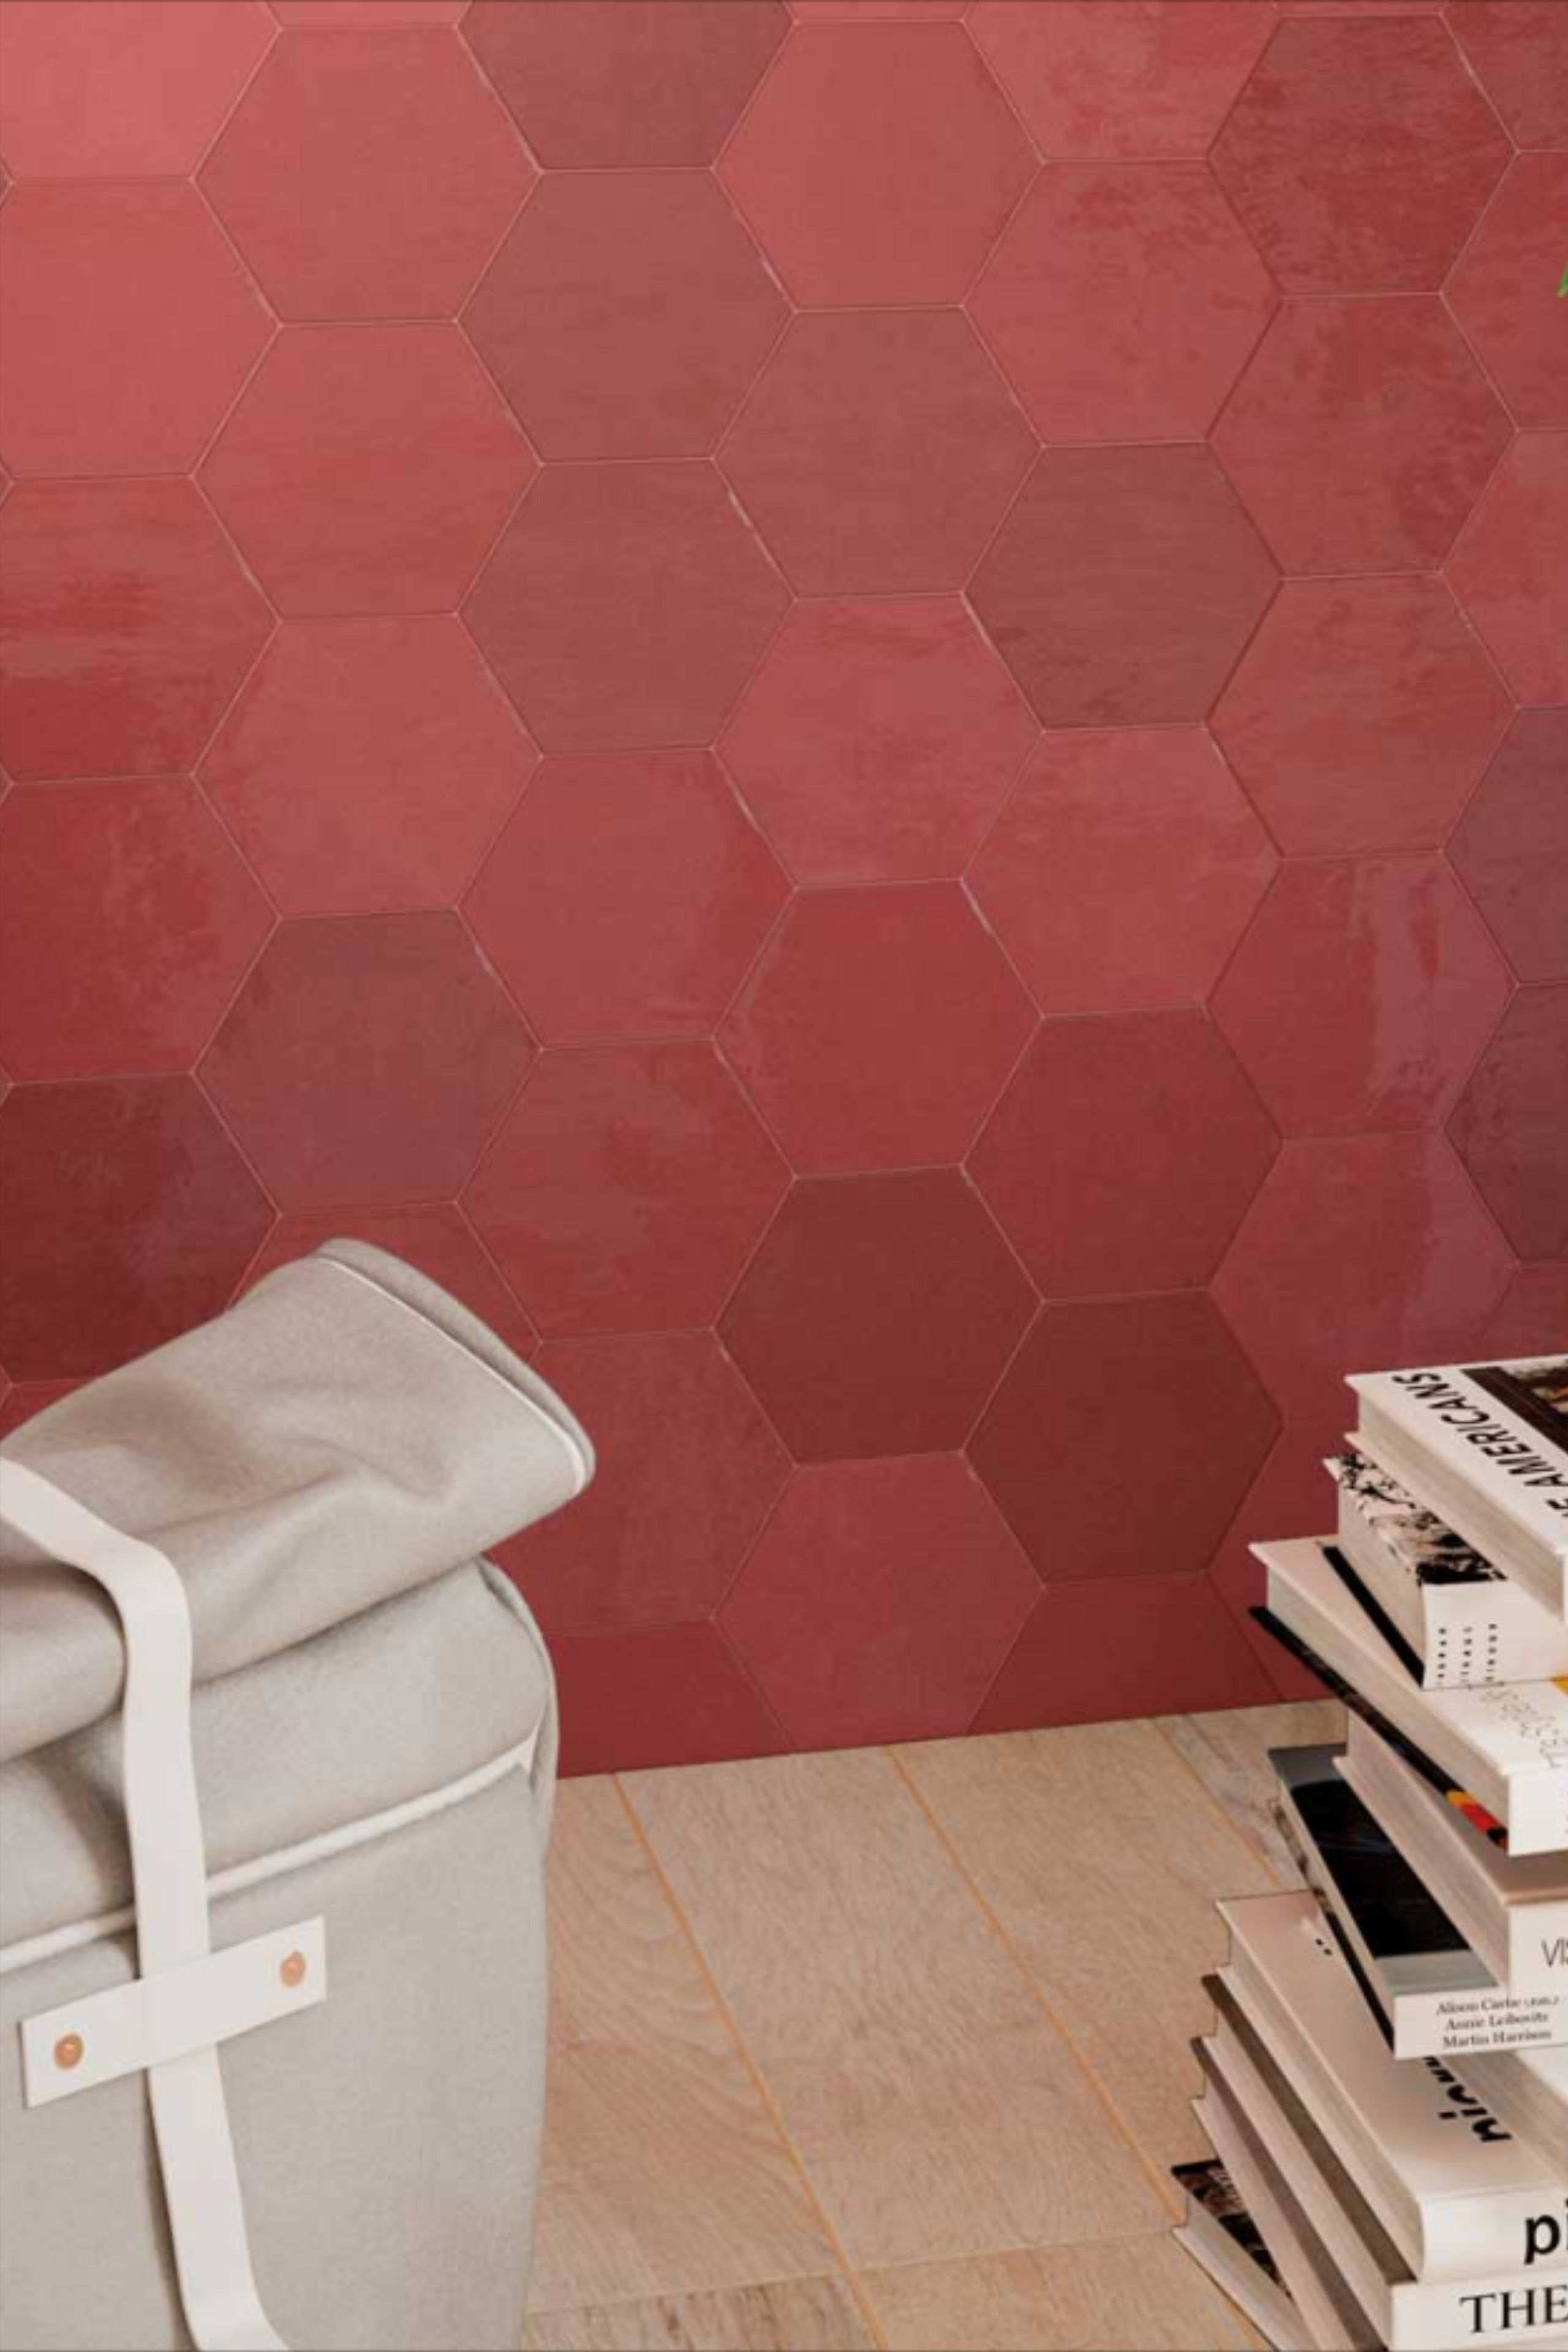 Deco Hexagonale Rouge En 2020 Carrelage Carrelage Mural Carrelage Gres Cerame